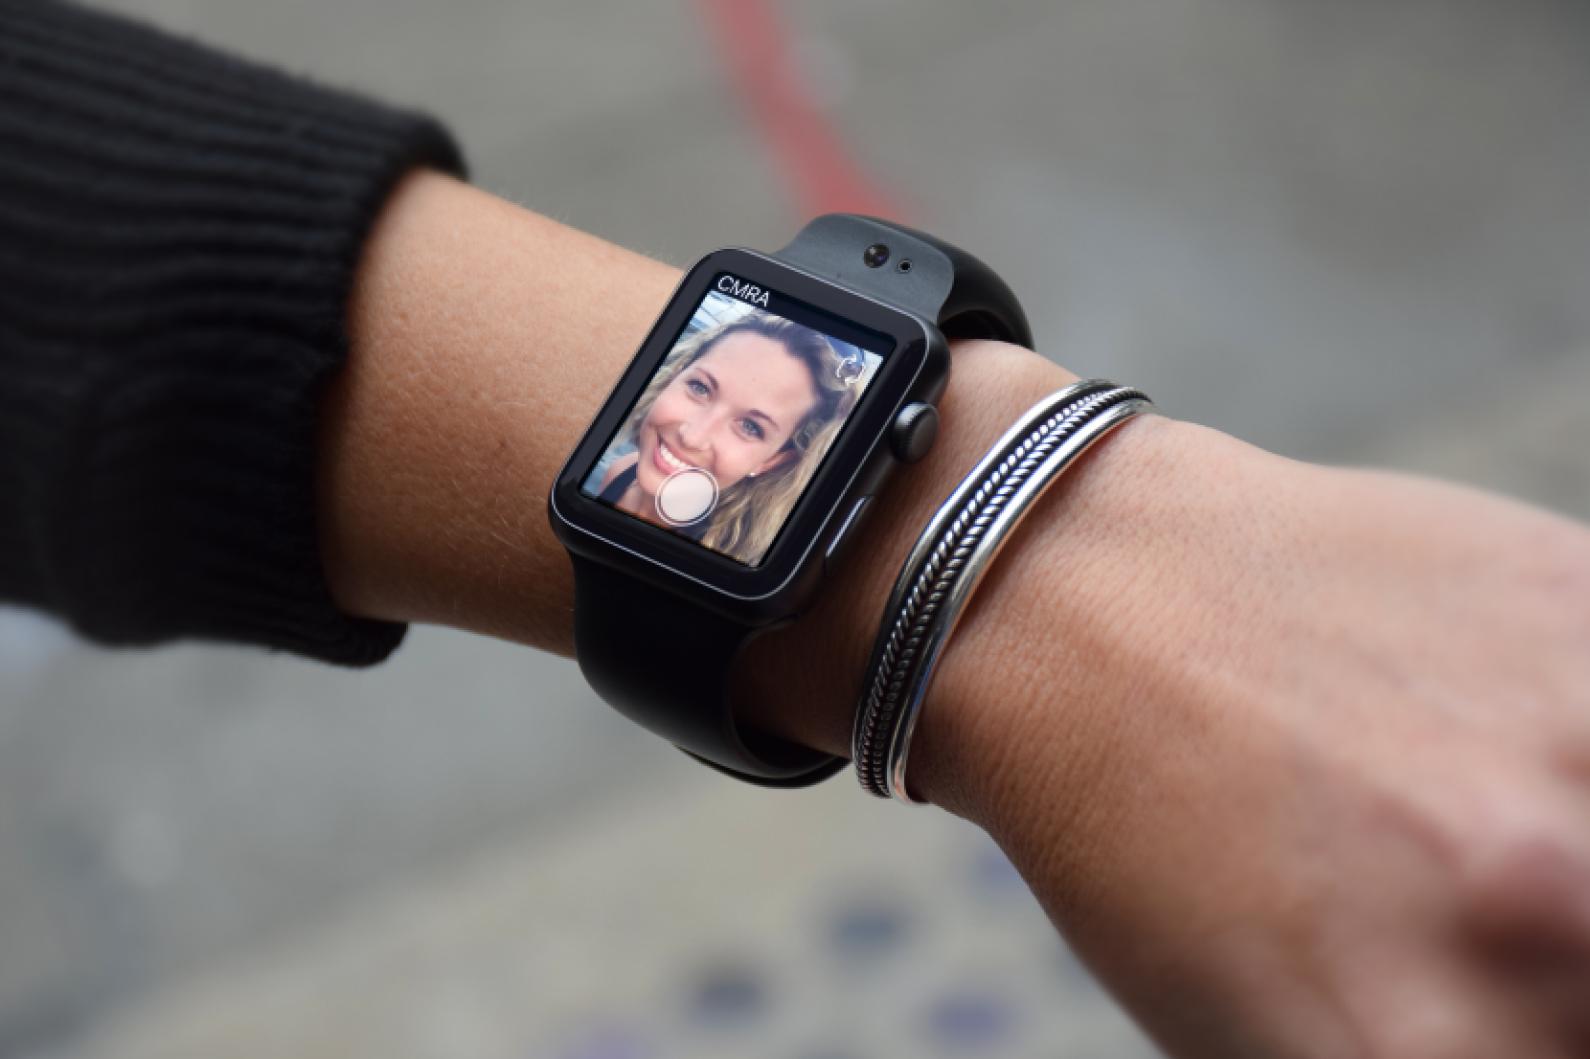 CMRA apple watch band camera